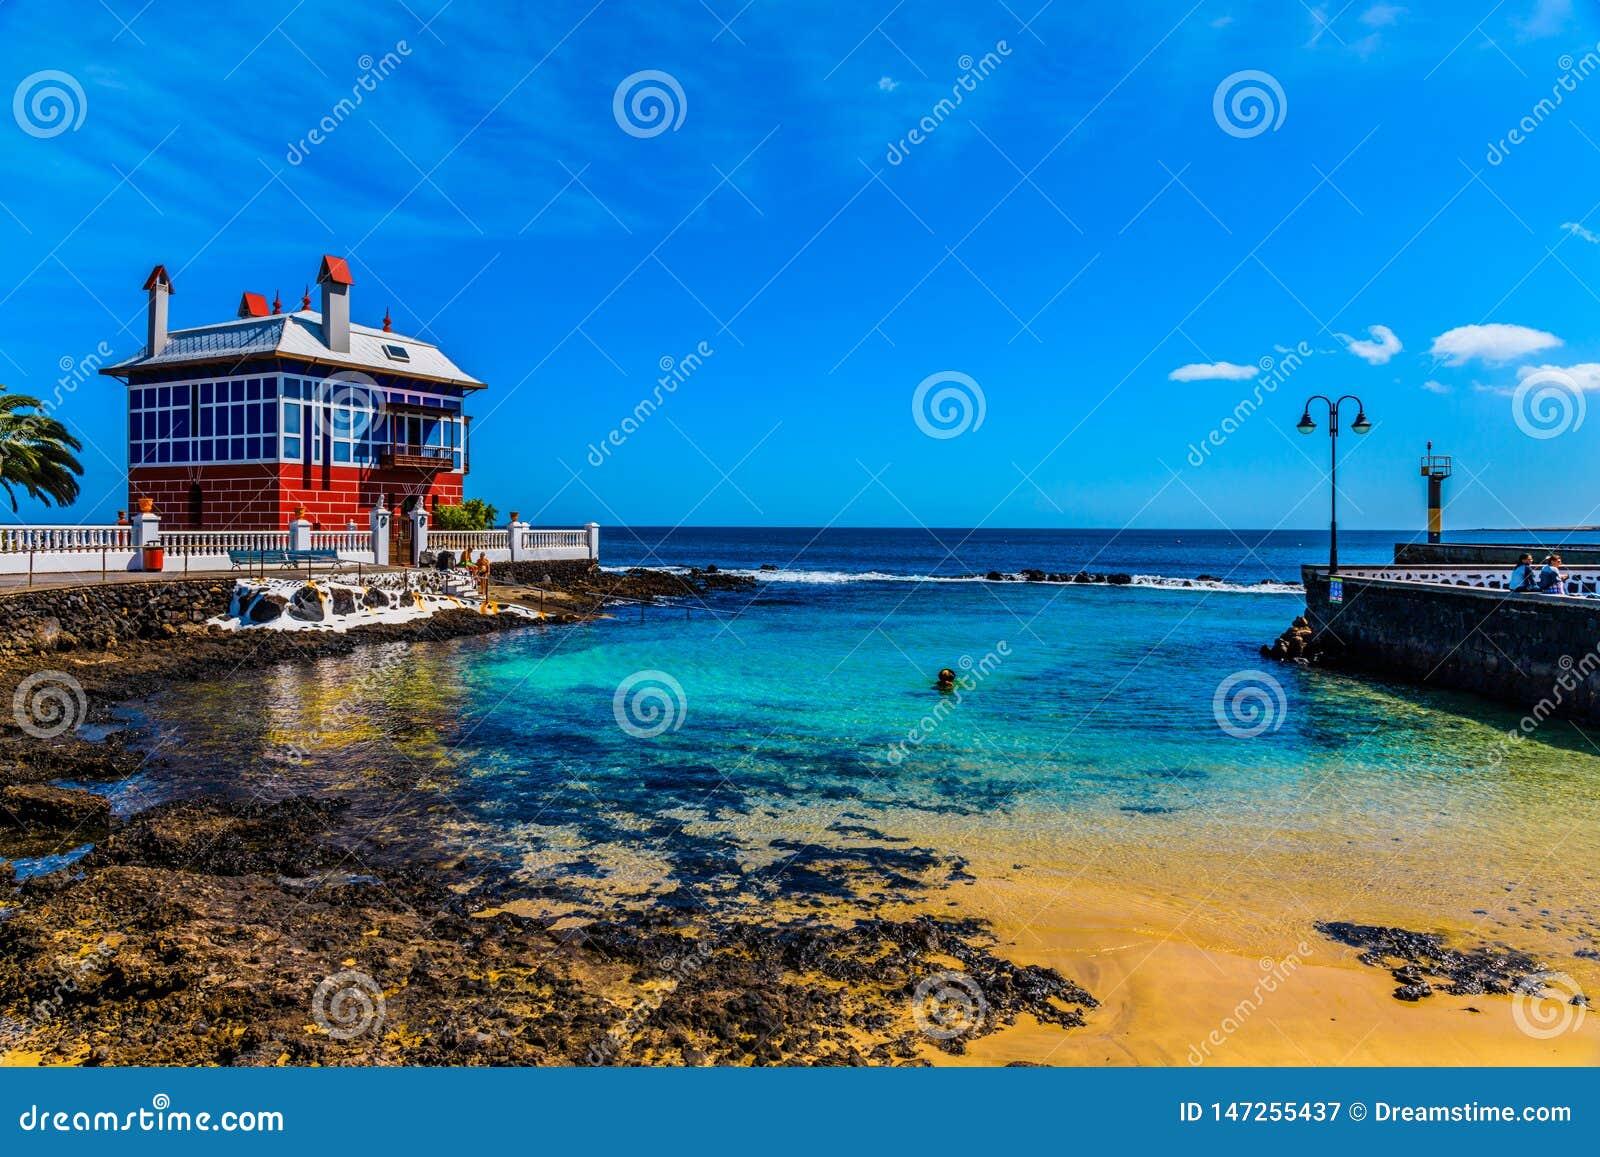 La casa roja en la playa